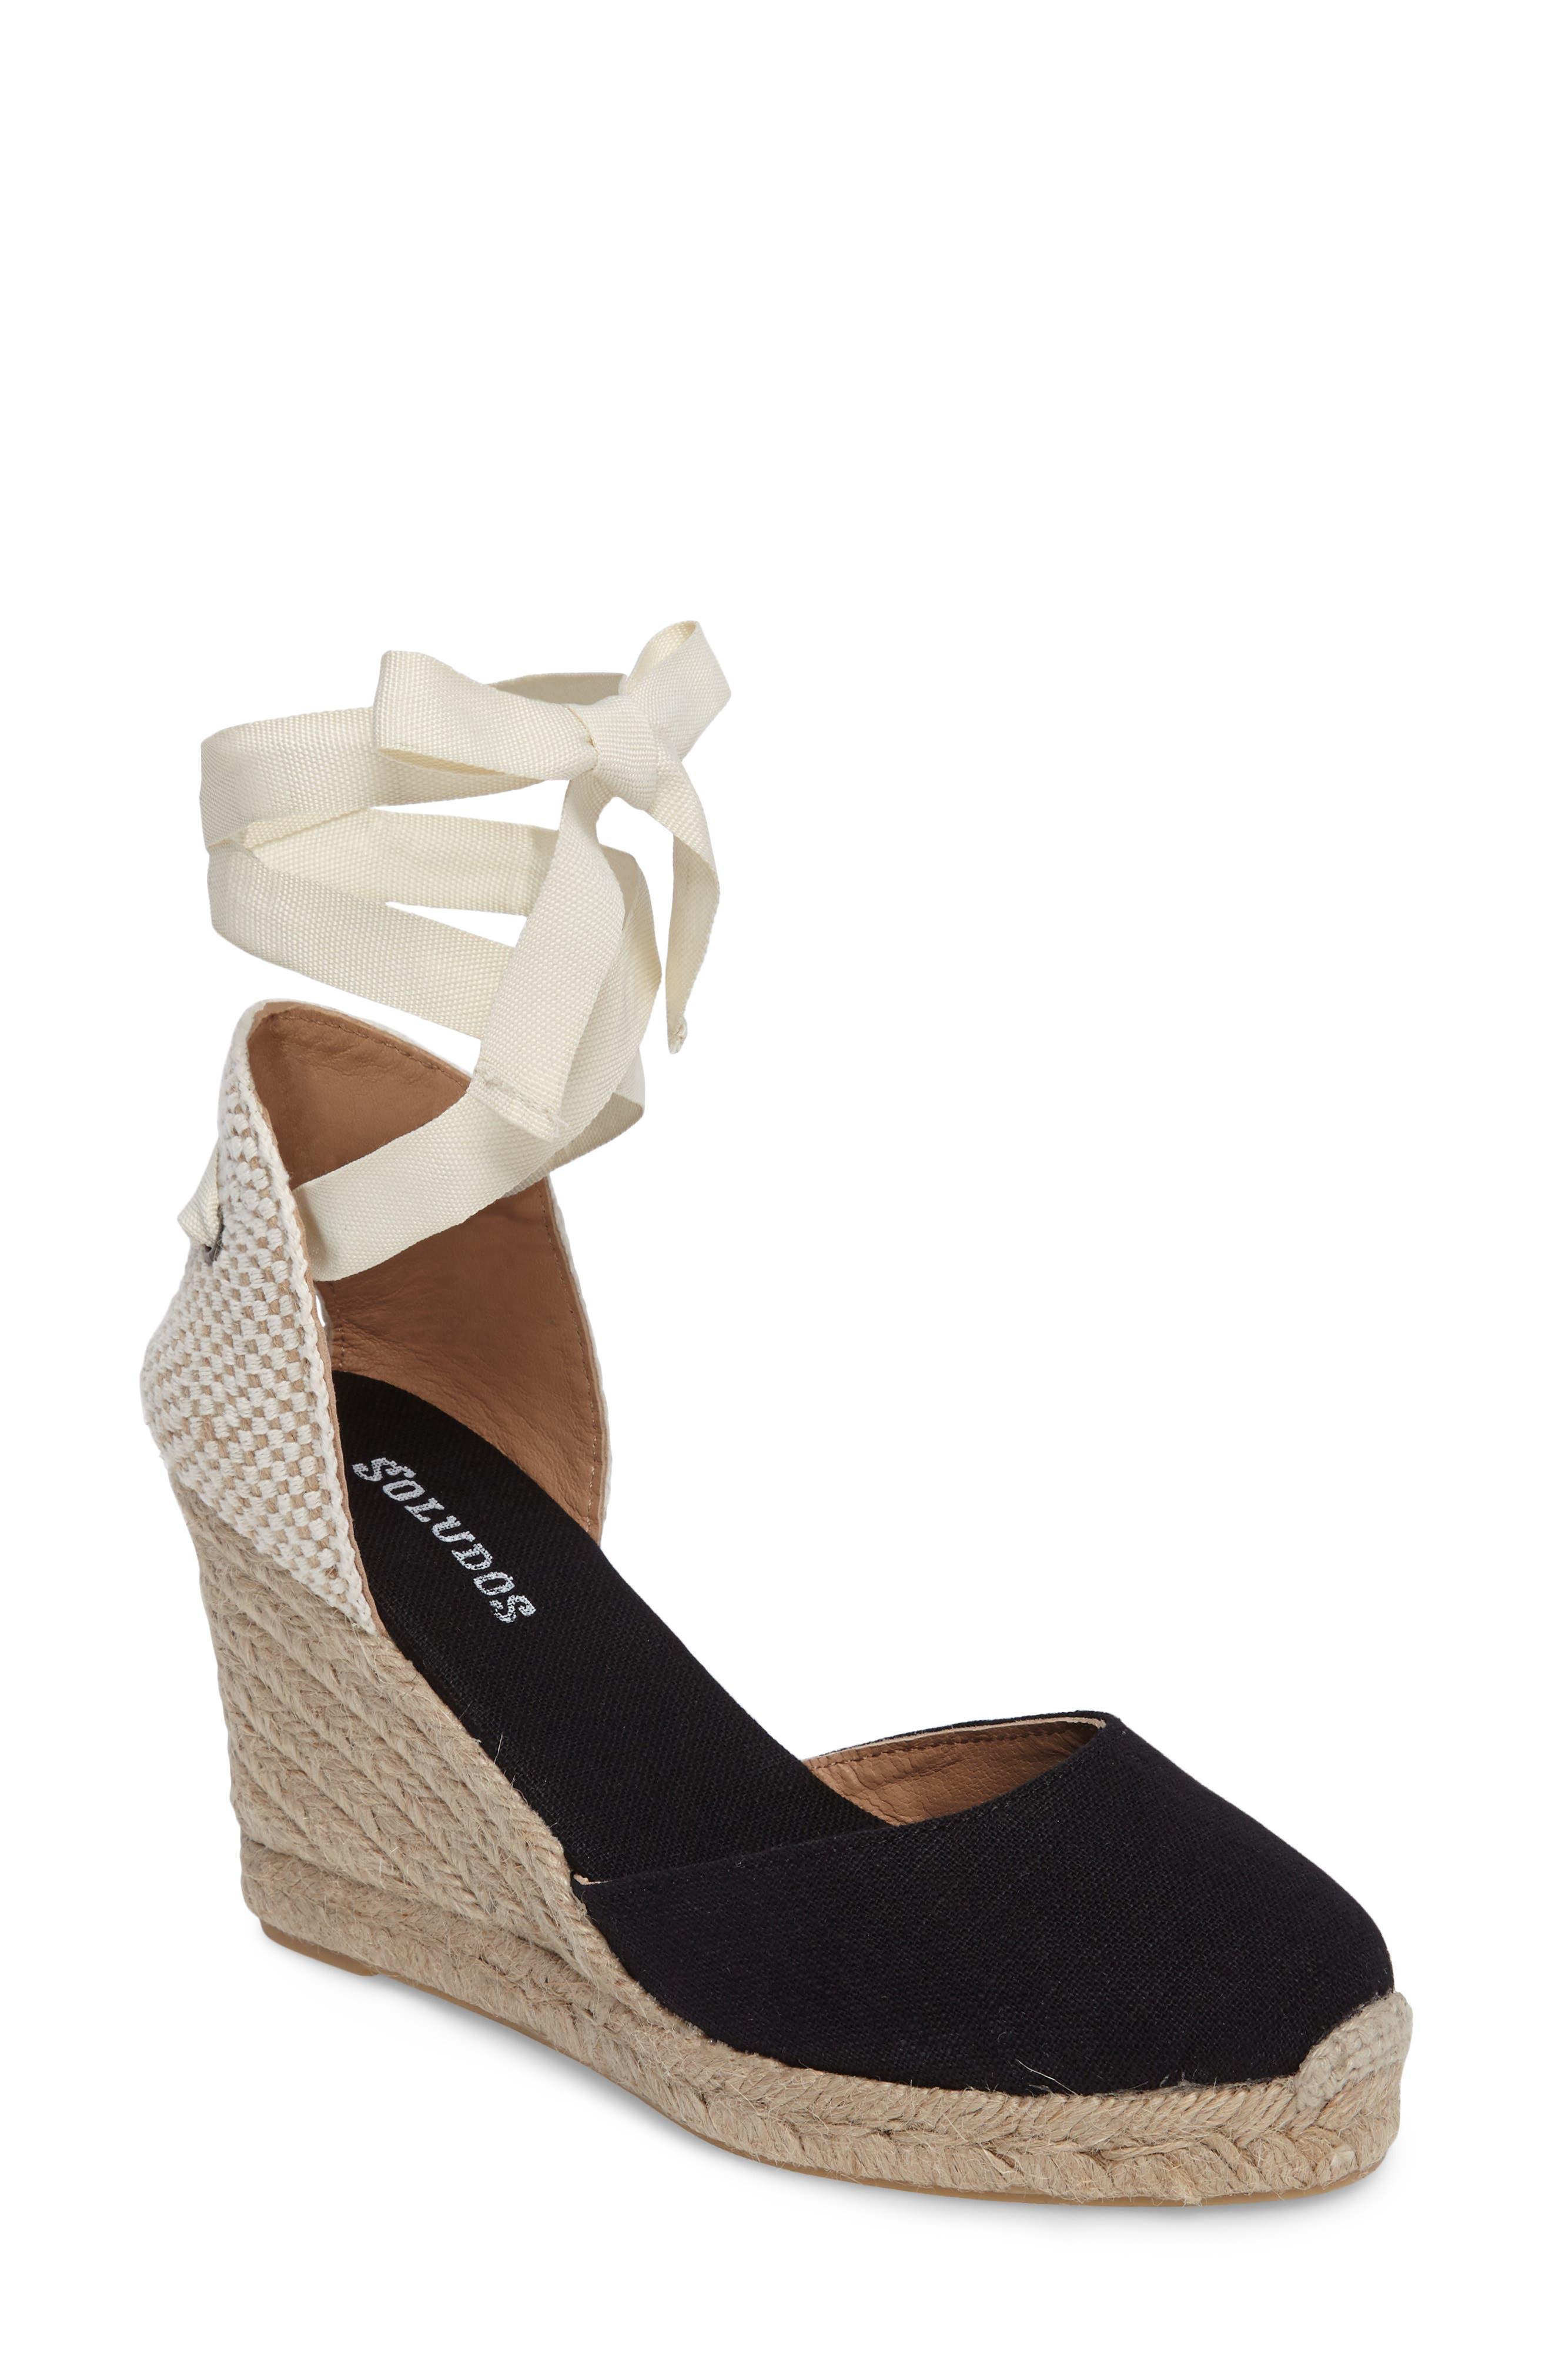 Wedge Lace-Up Espadrille Sandal,                         Main,                         color, BLACK